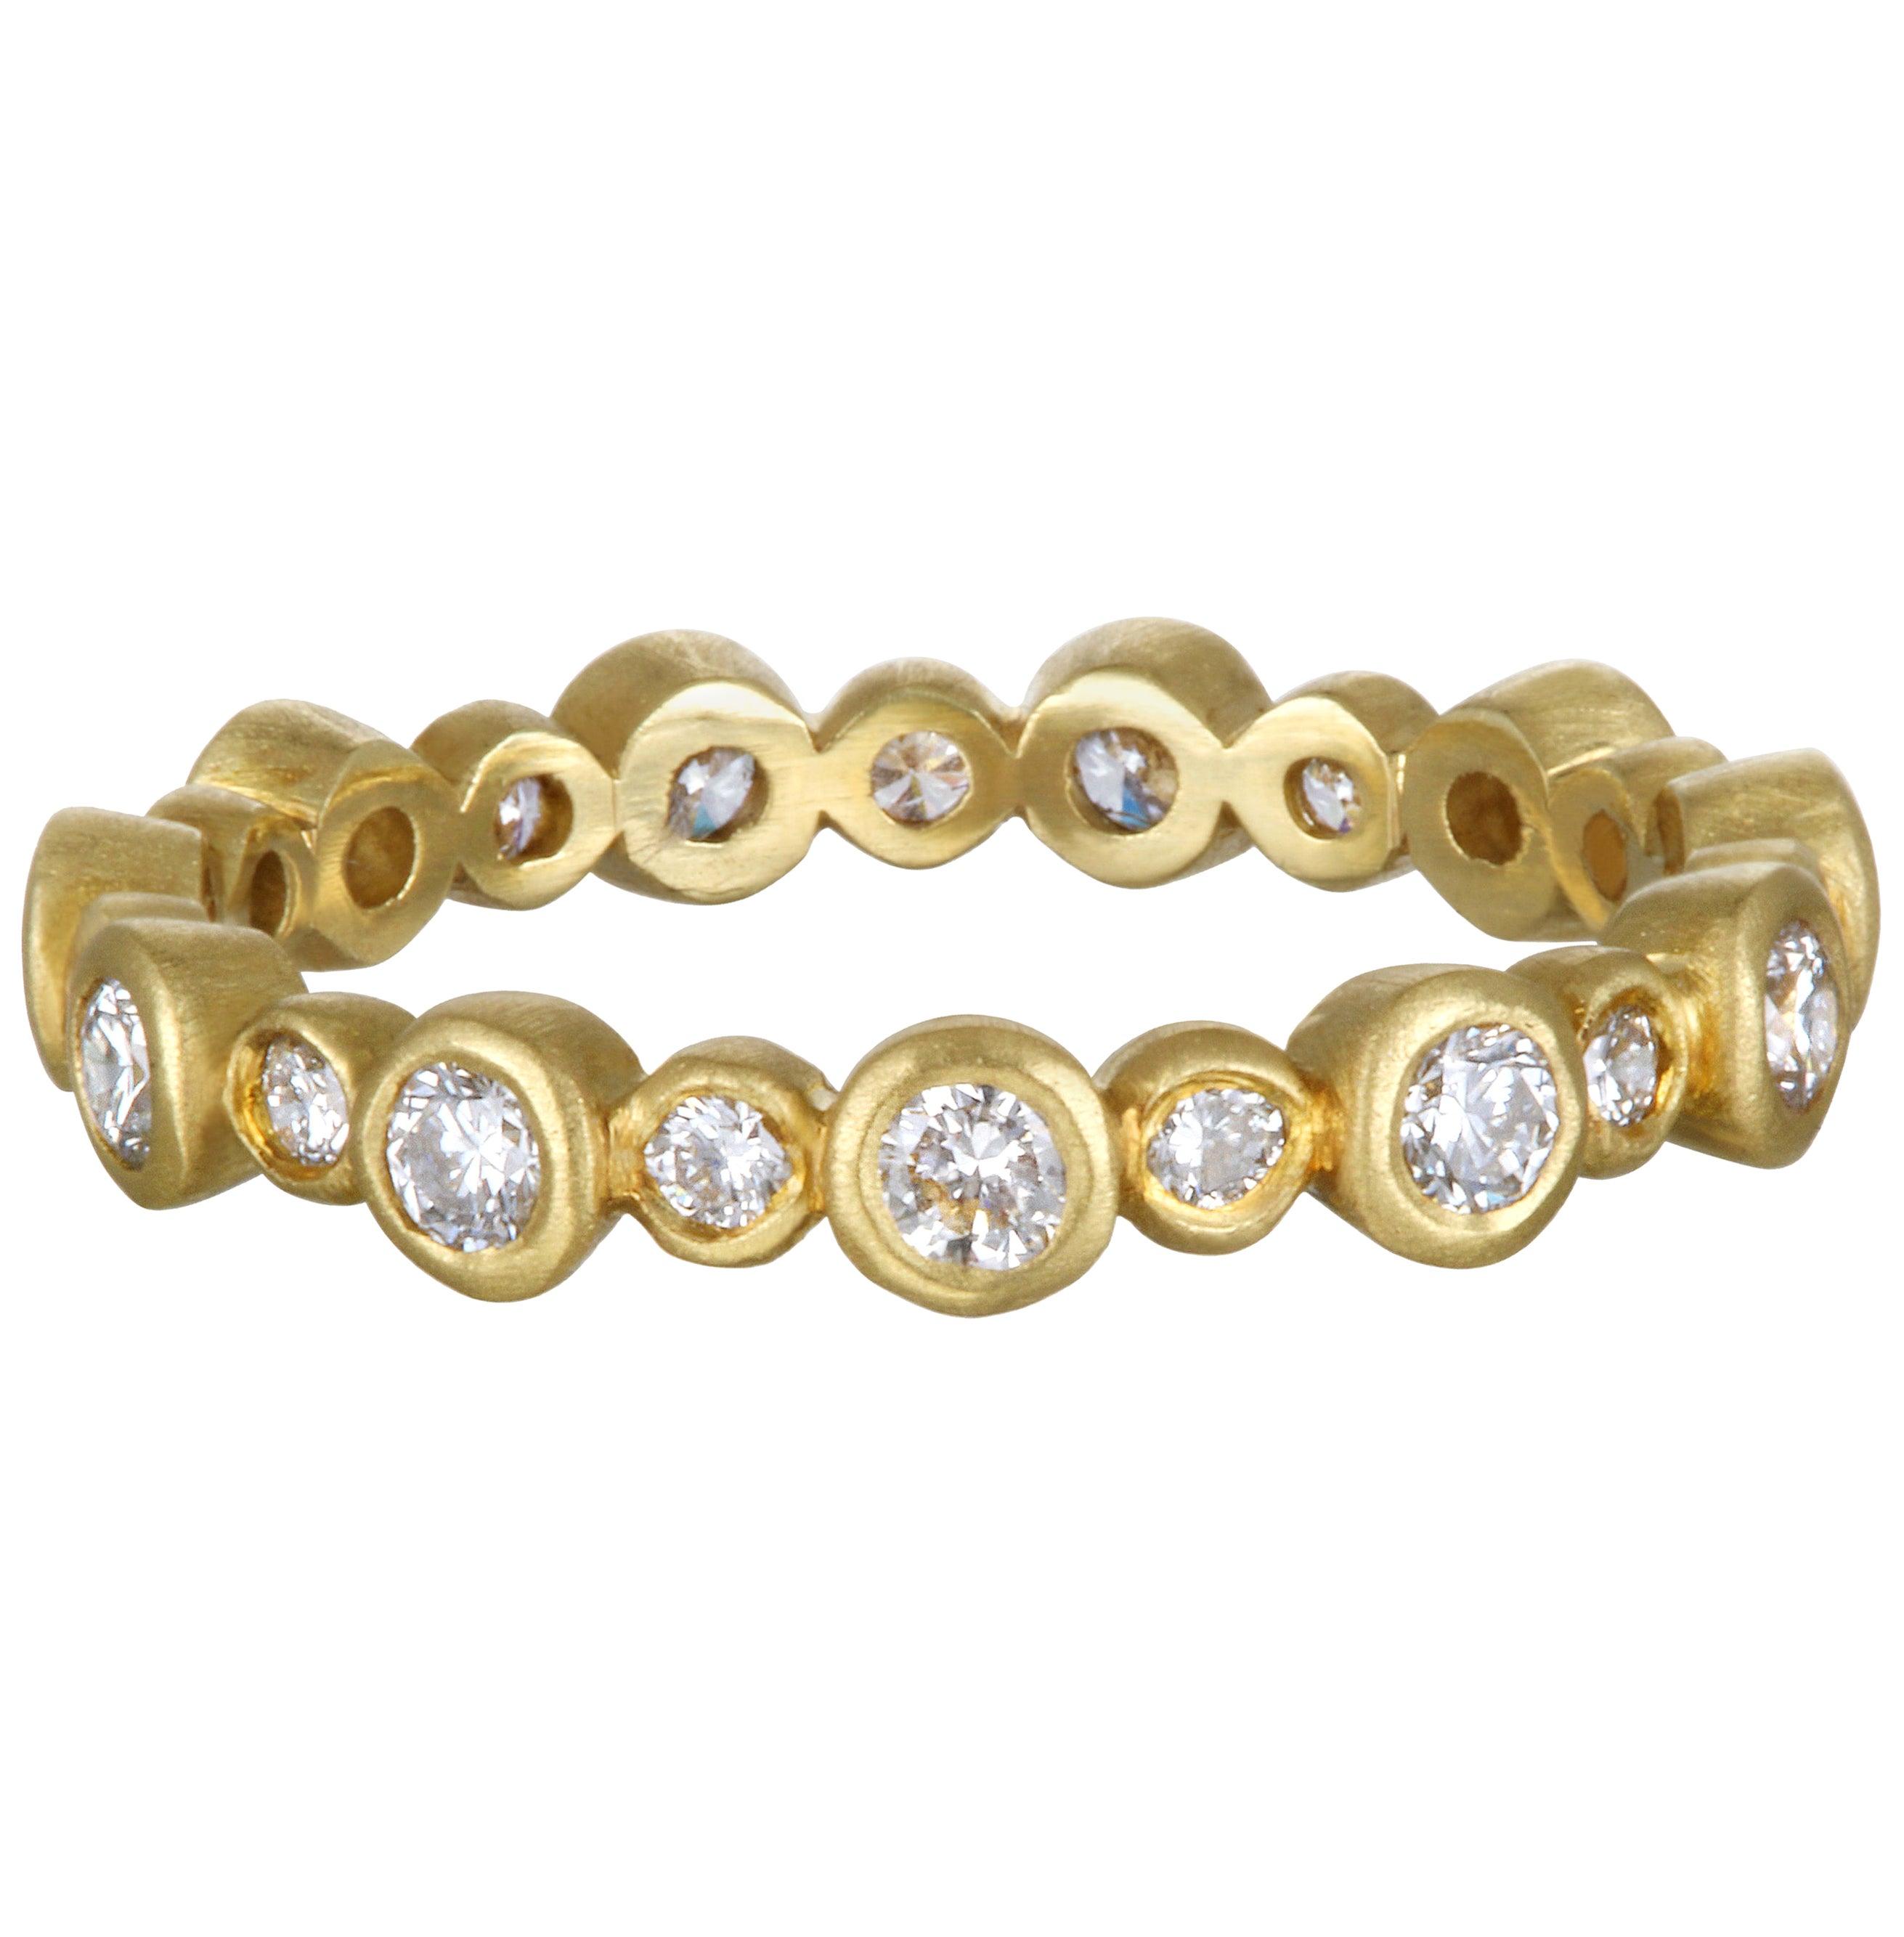 Faye Kim 18 Karat Gold Diamond Eternity Band Ring